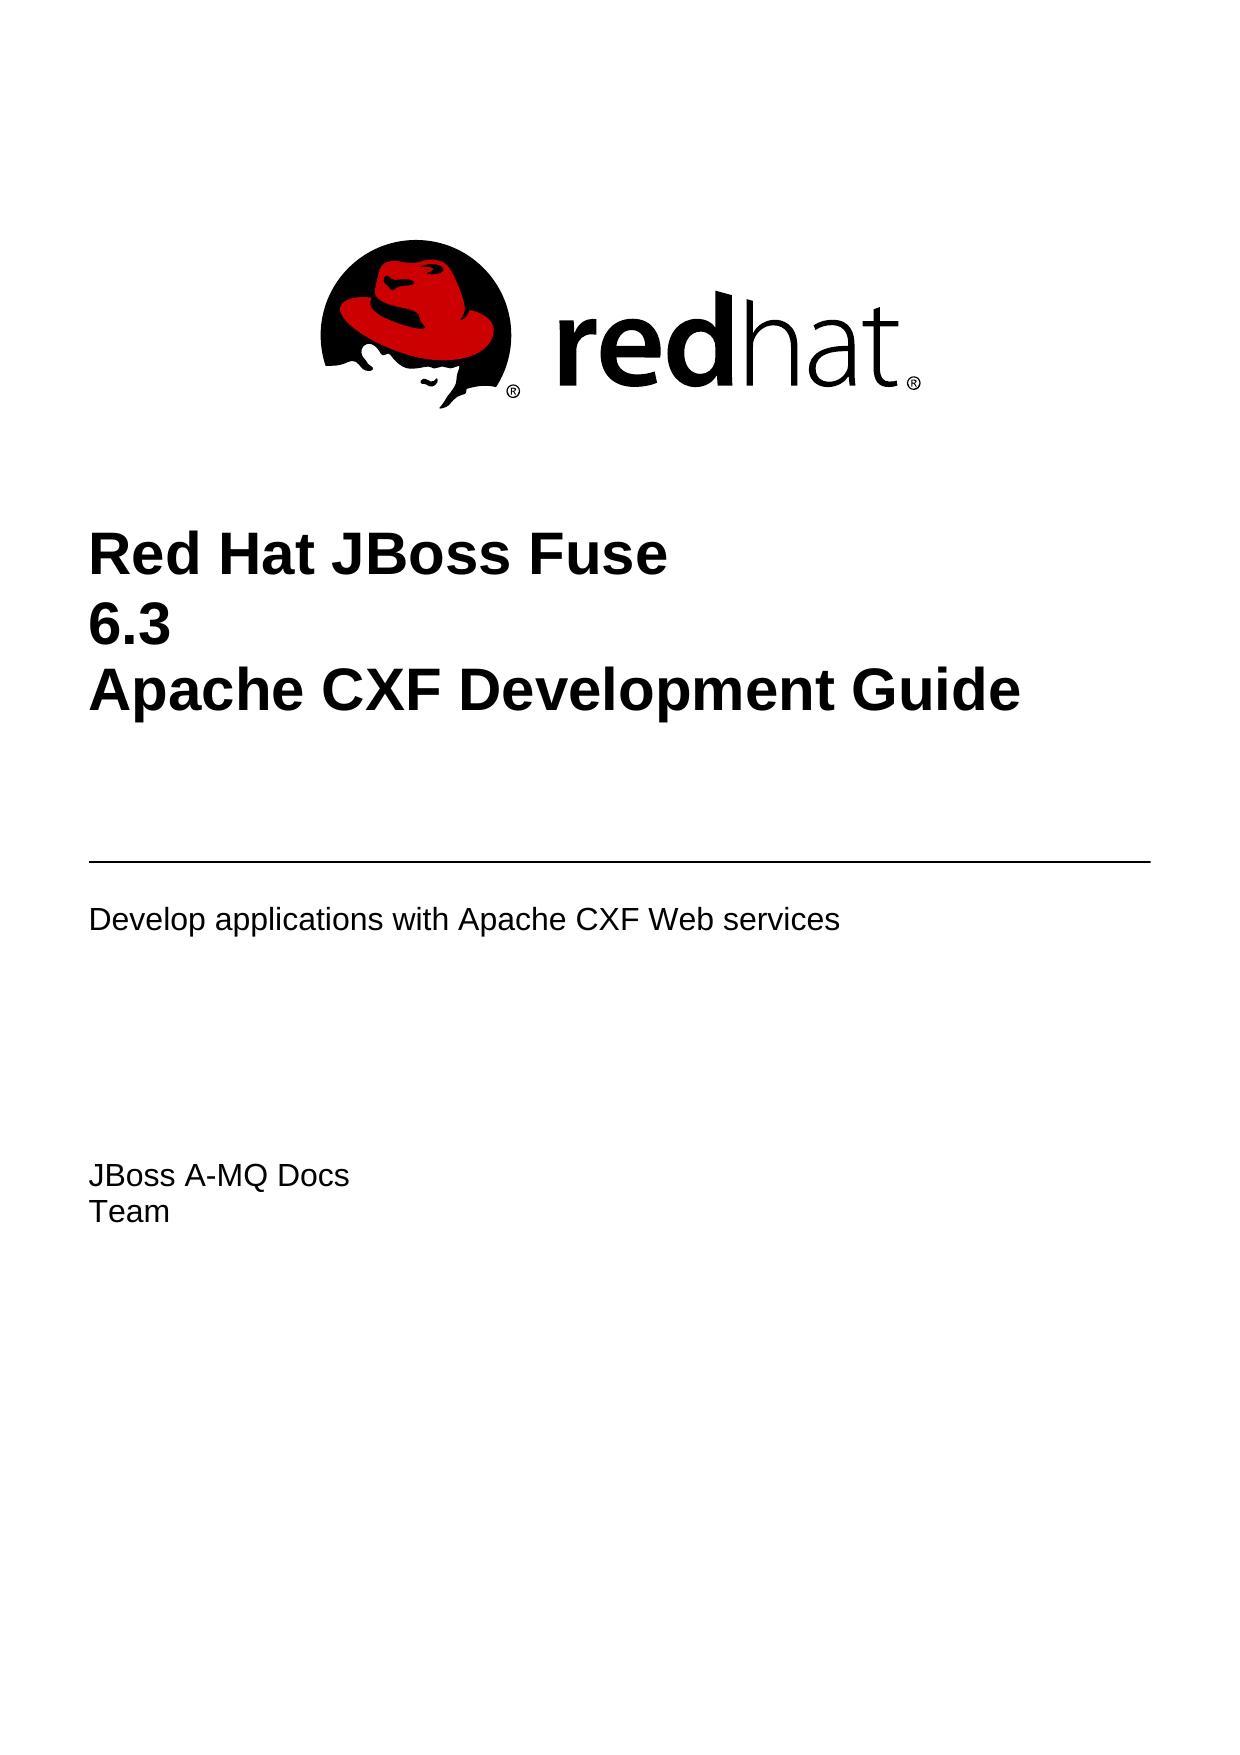 Red Hat JBoss Fuse 6 3 Apache CXF Development Guide